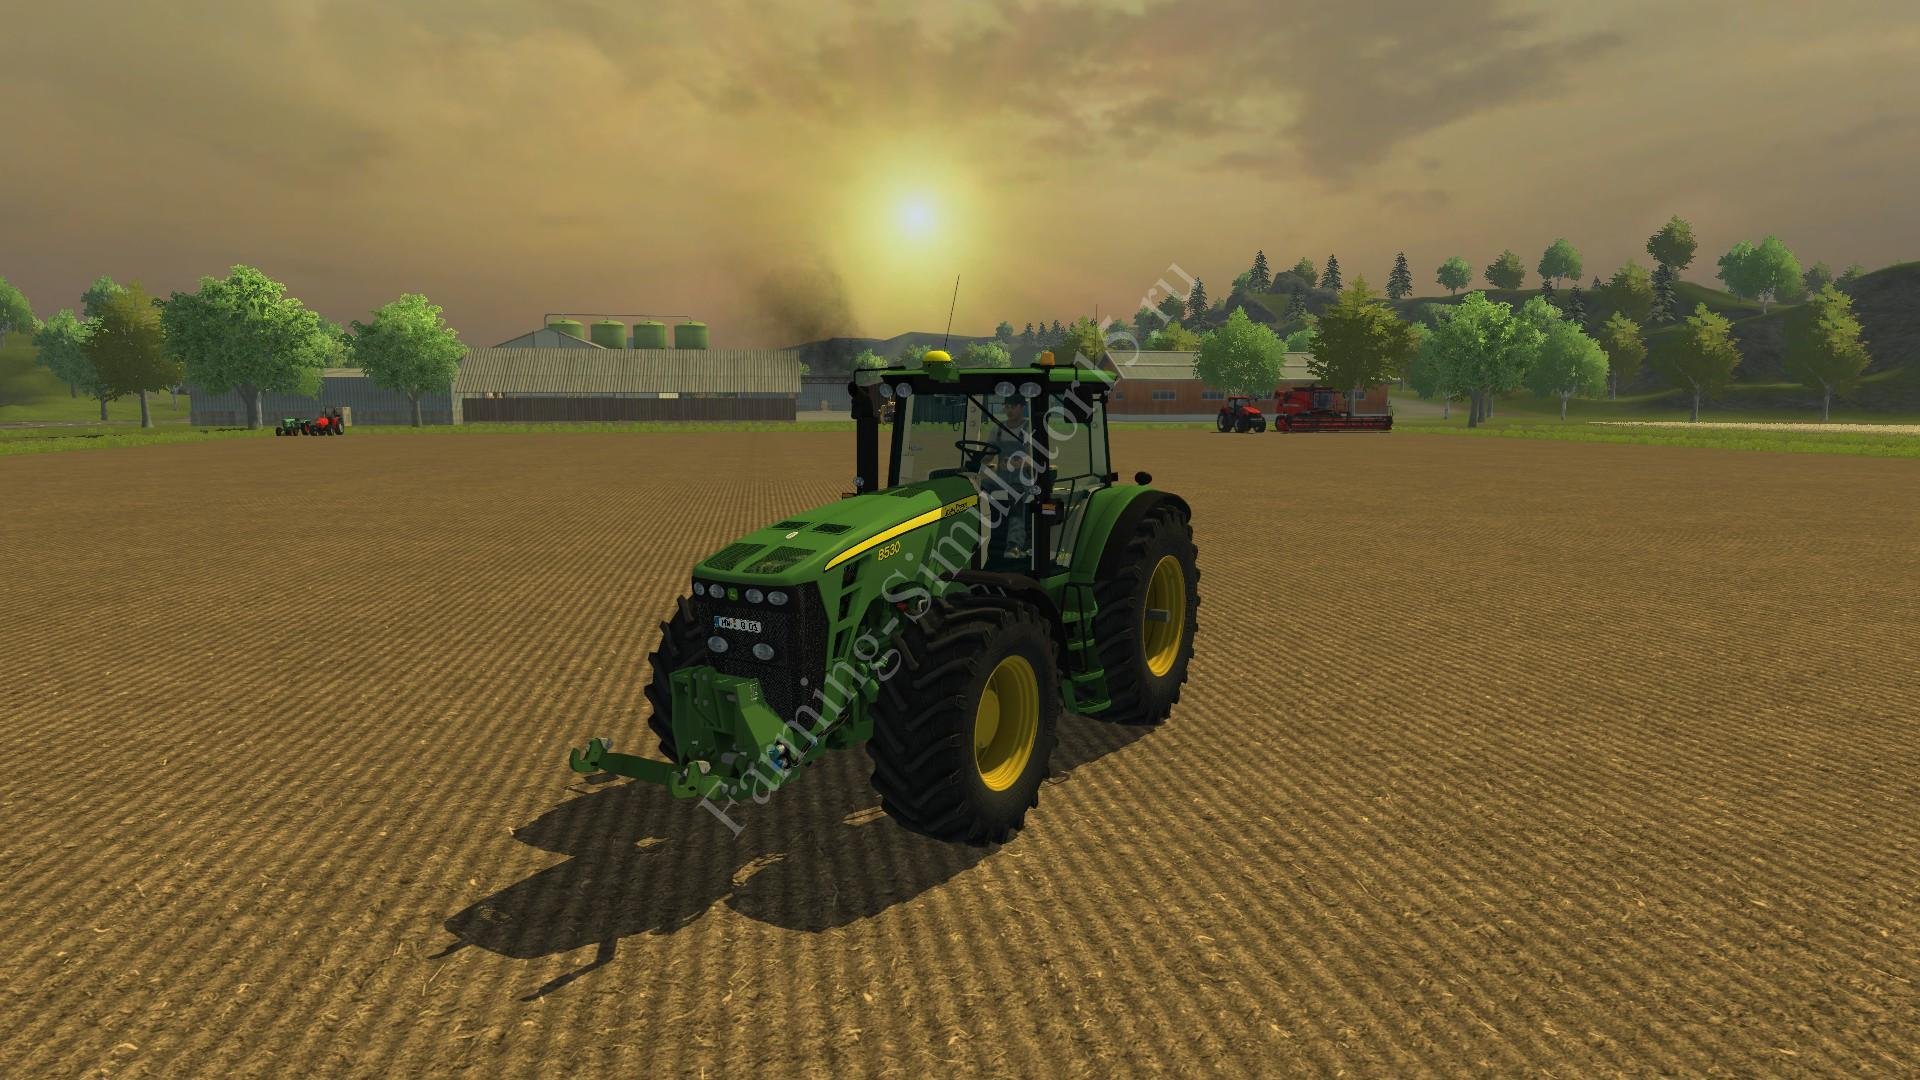 Мод трактора John Deere 8530 Powershift FH v 2.2 Farming Simulator 2013, Farming Simulator 13